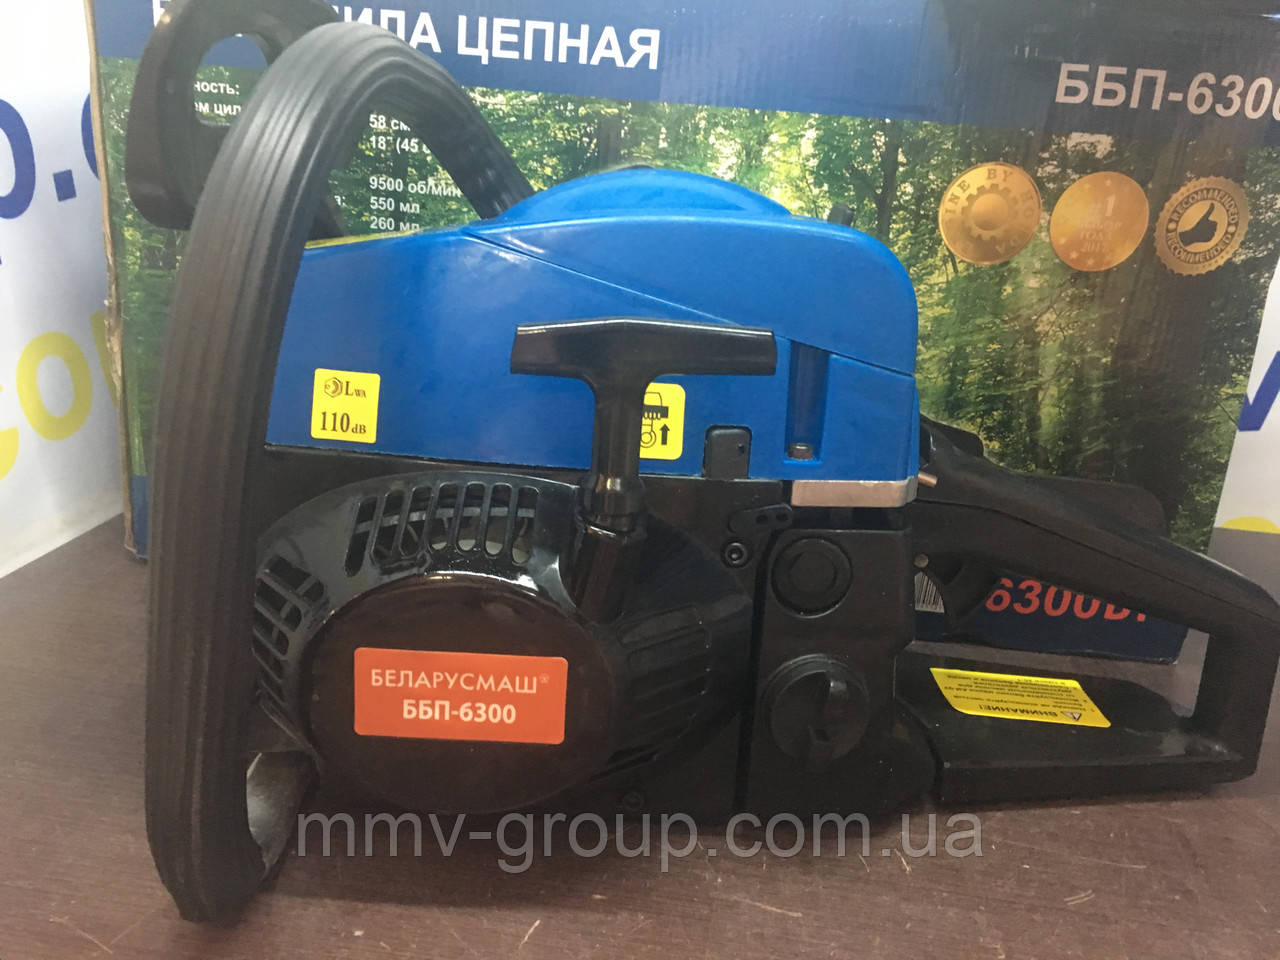 Бензопила Беларусмаш ББП 6300 праймер ,1 шина | 1 цепь